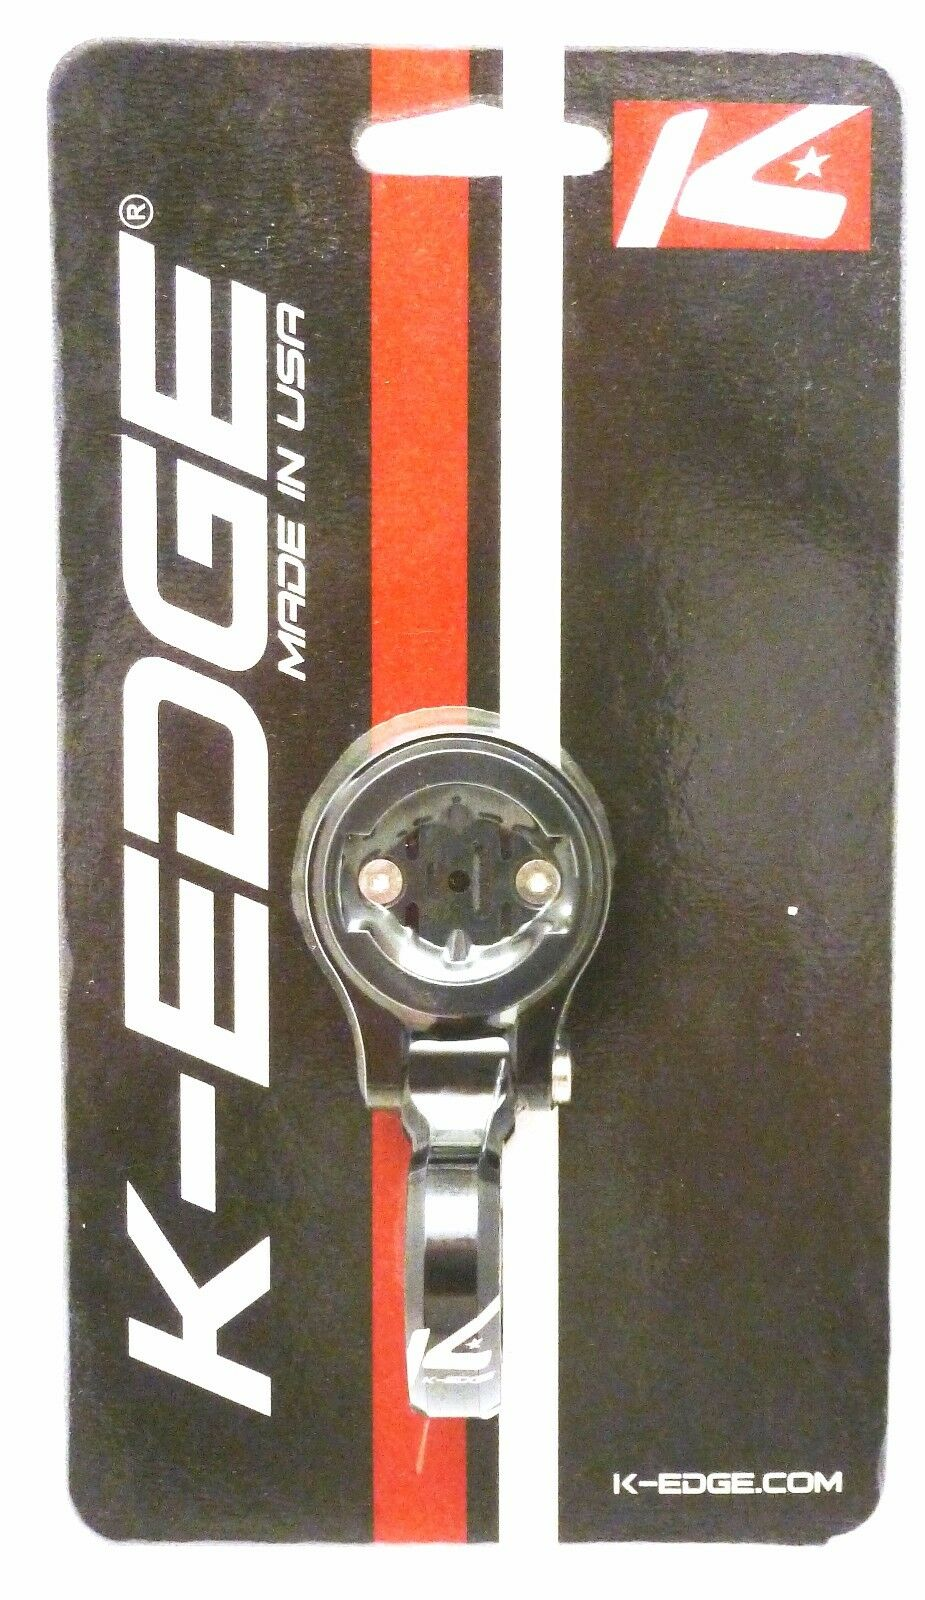 K-Edge Garmin Sport TT Aero Mount 22.2 for All Edge Computers K Edge